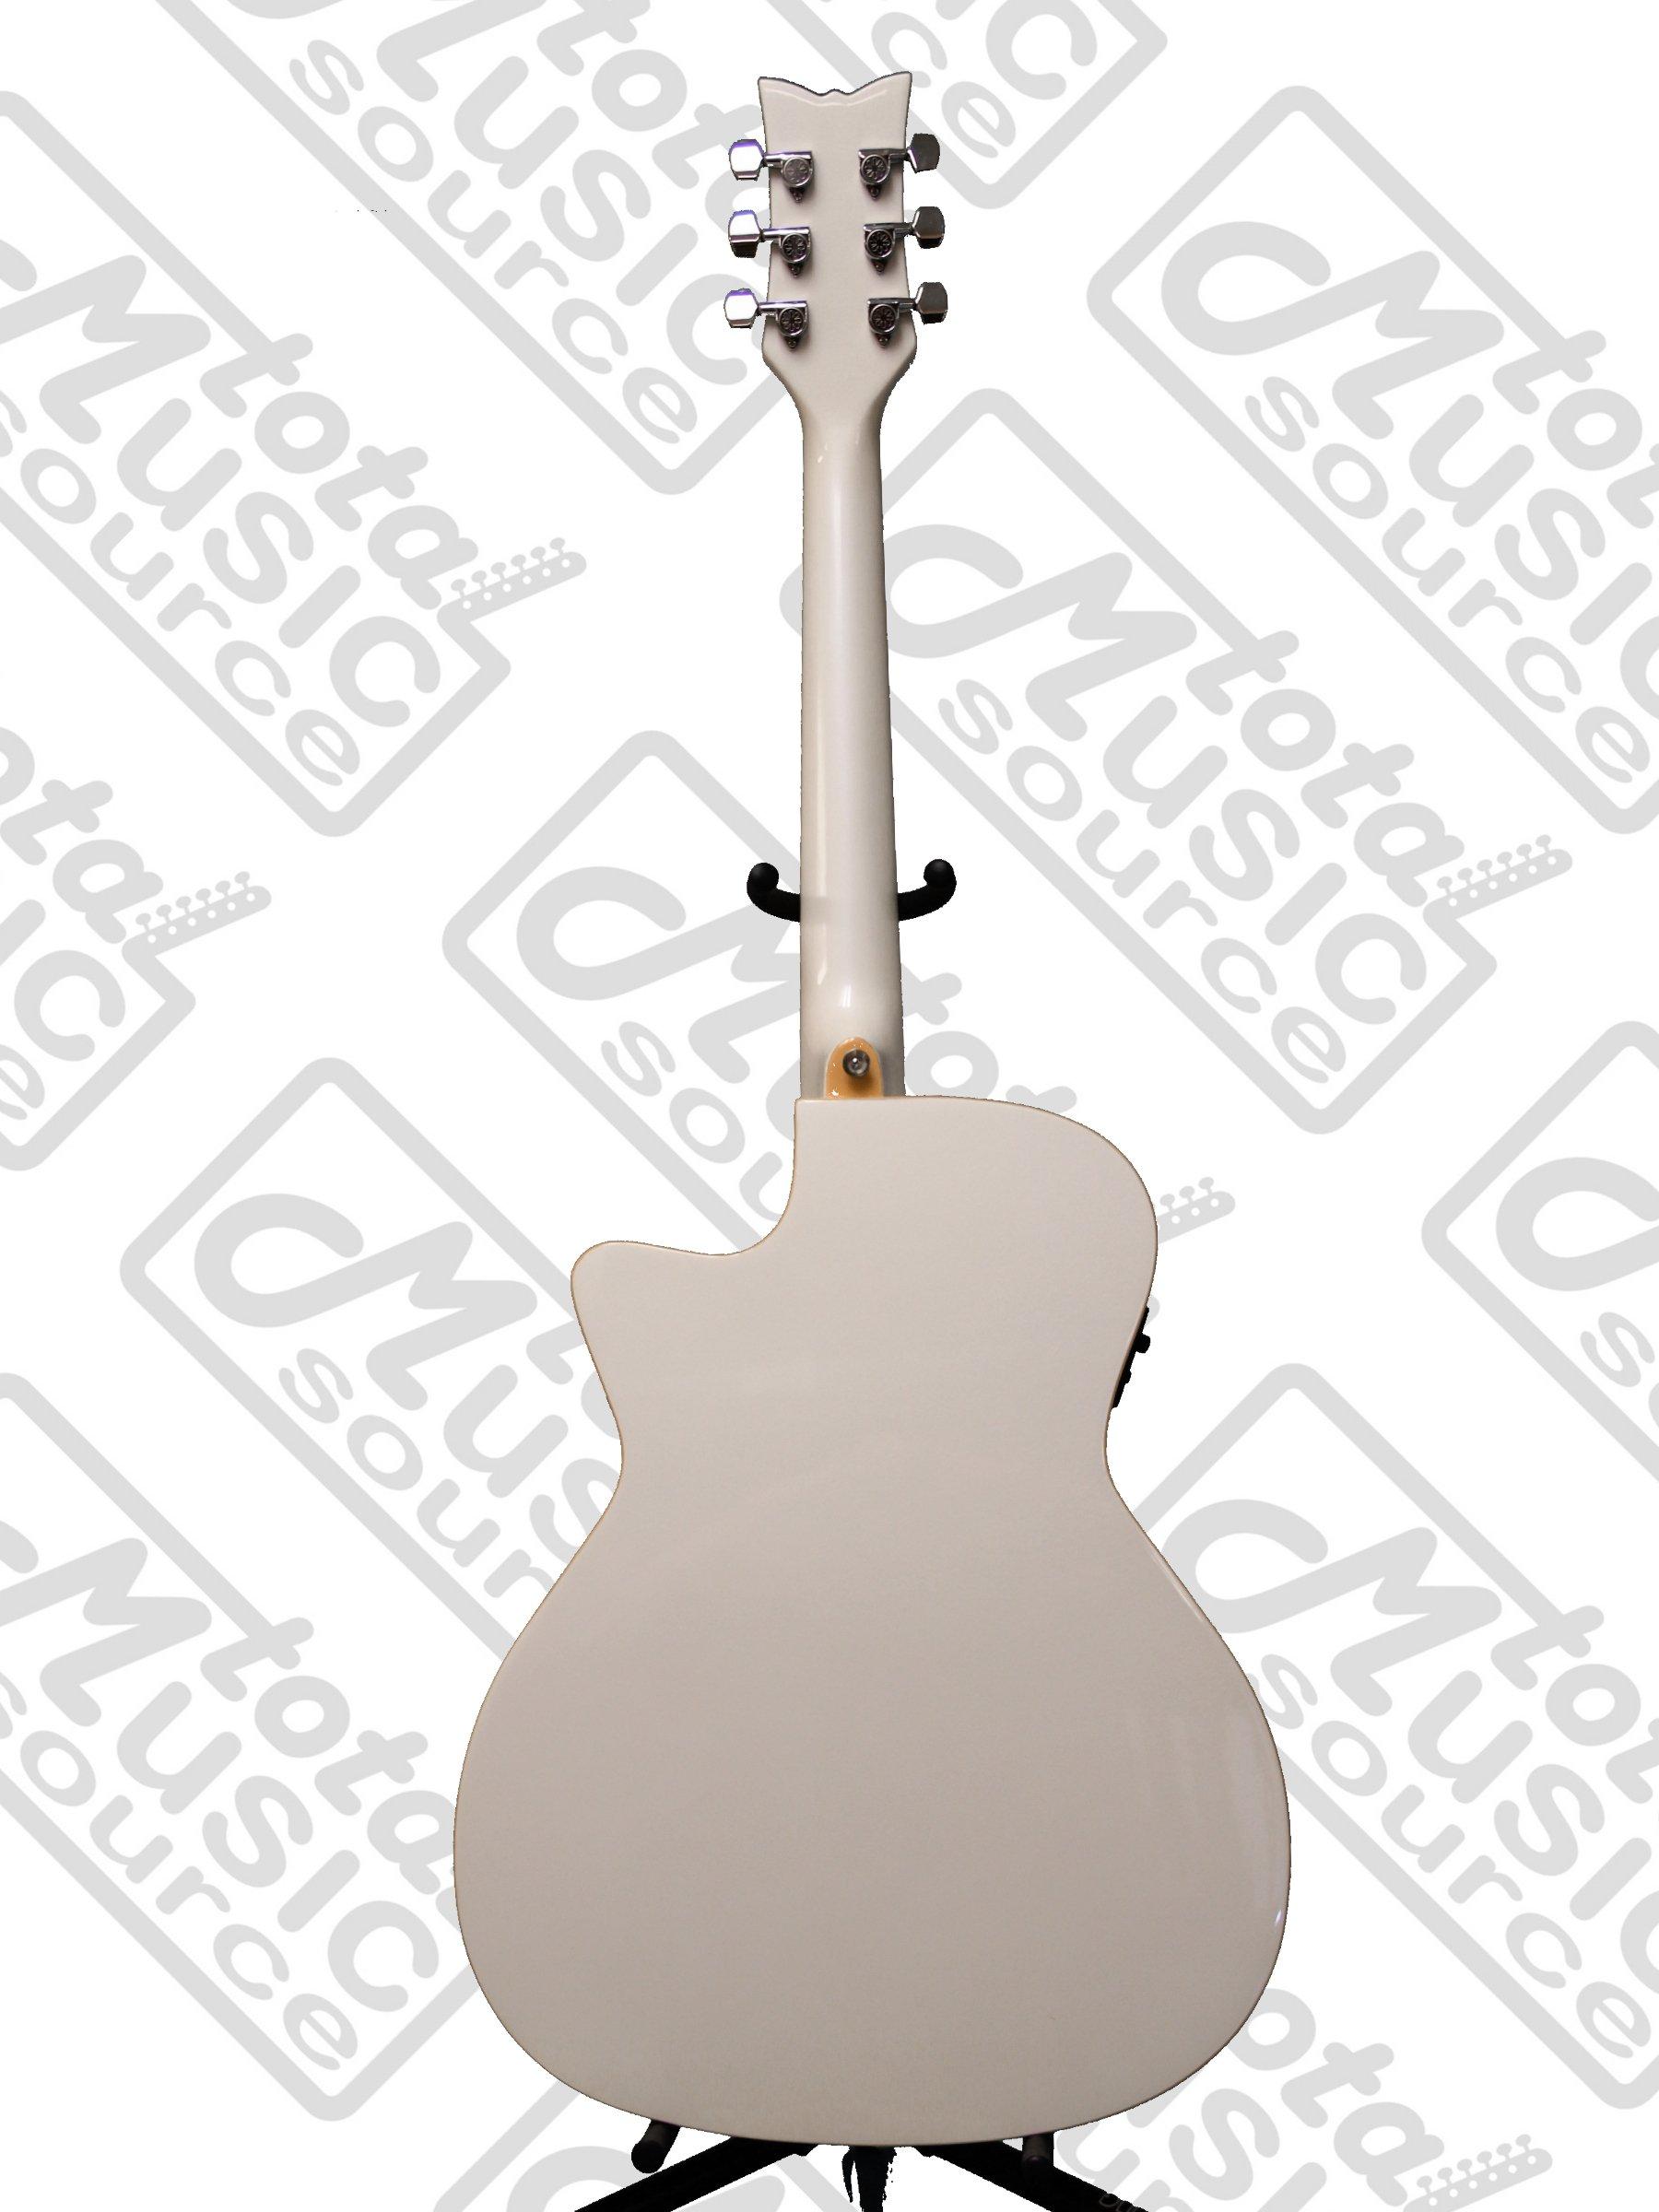 Daisy Rock Wildwood Artist A/E Guitar, Fishman Piezo Pickup, Pearl, DR-6274 by Daisy Rock